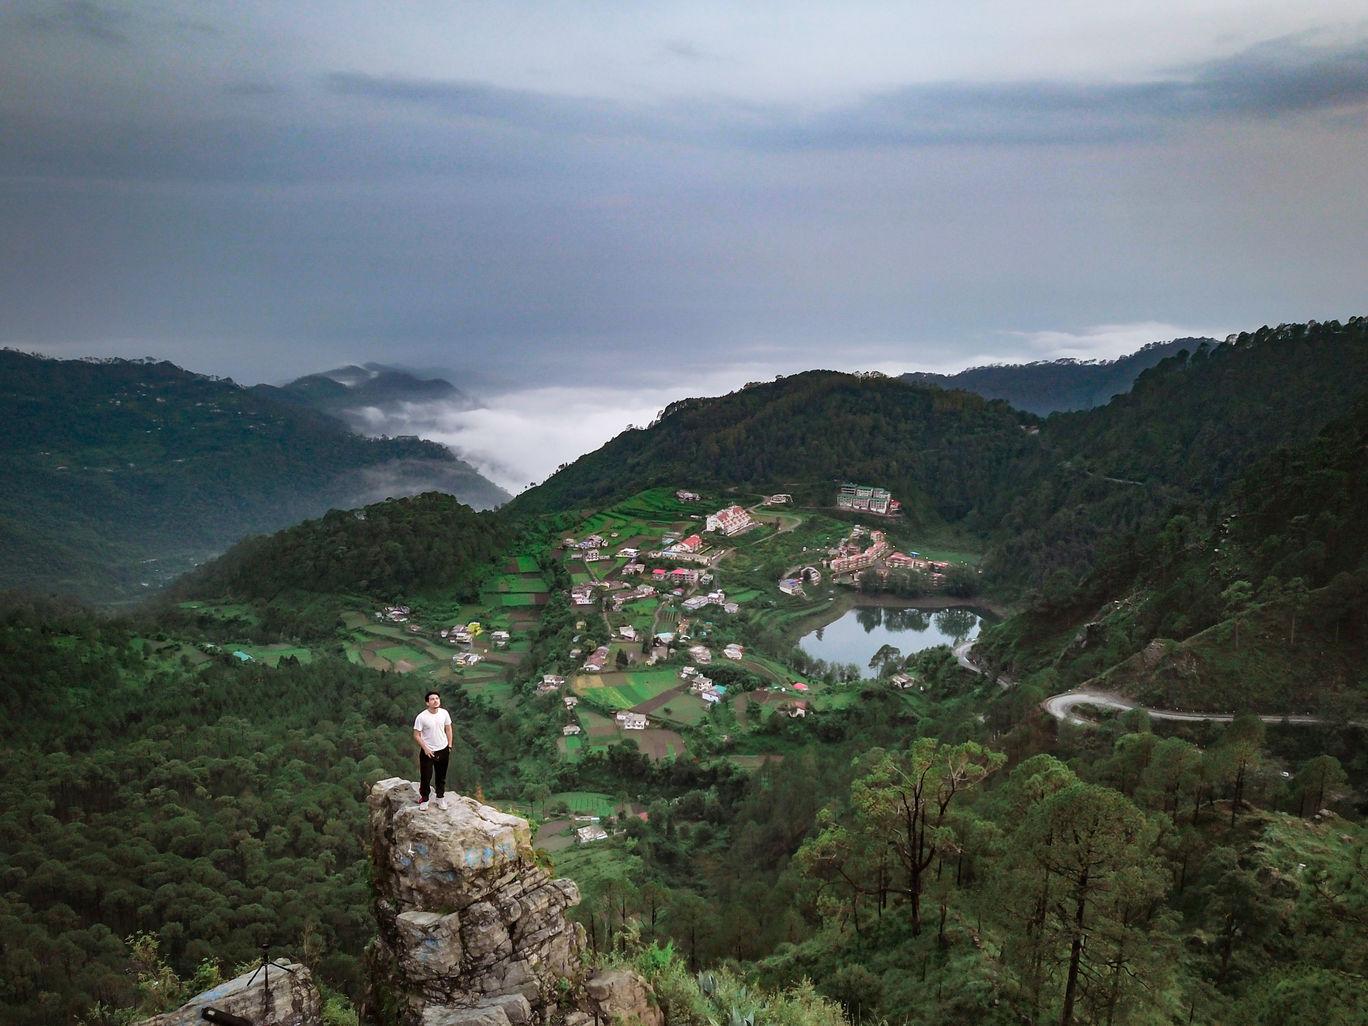 Photo of Khurpatal By Gunj Guglani